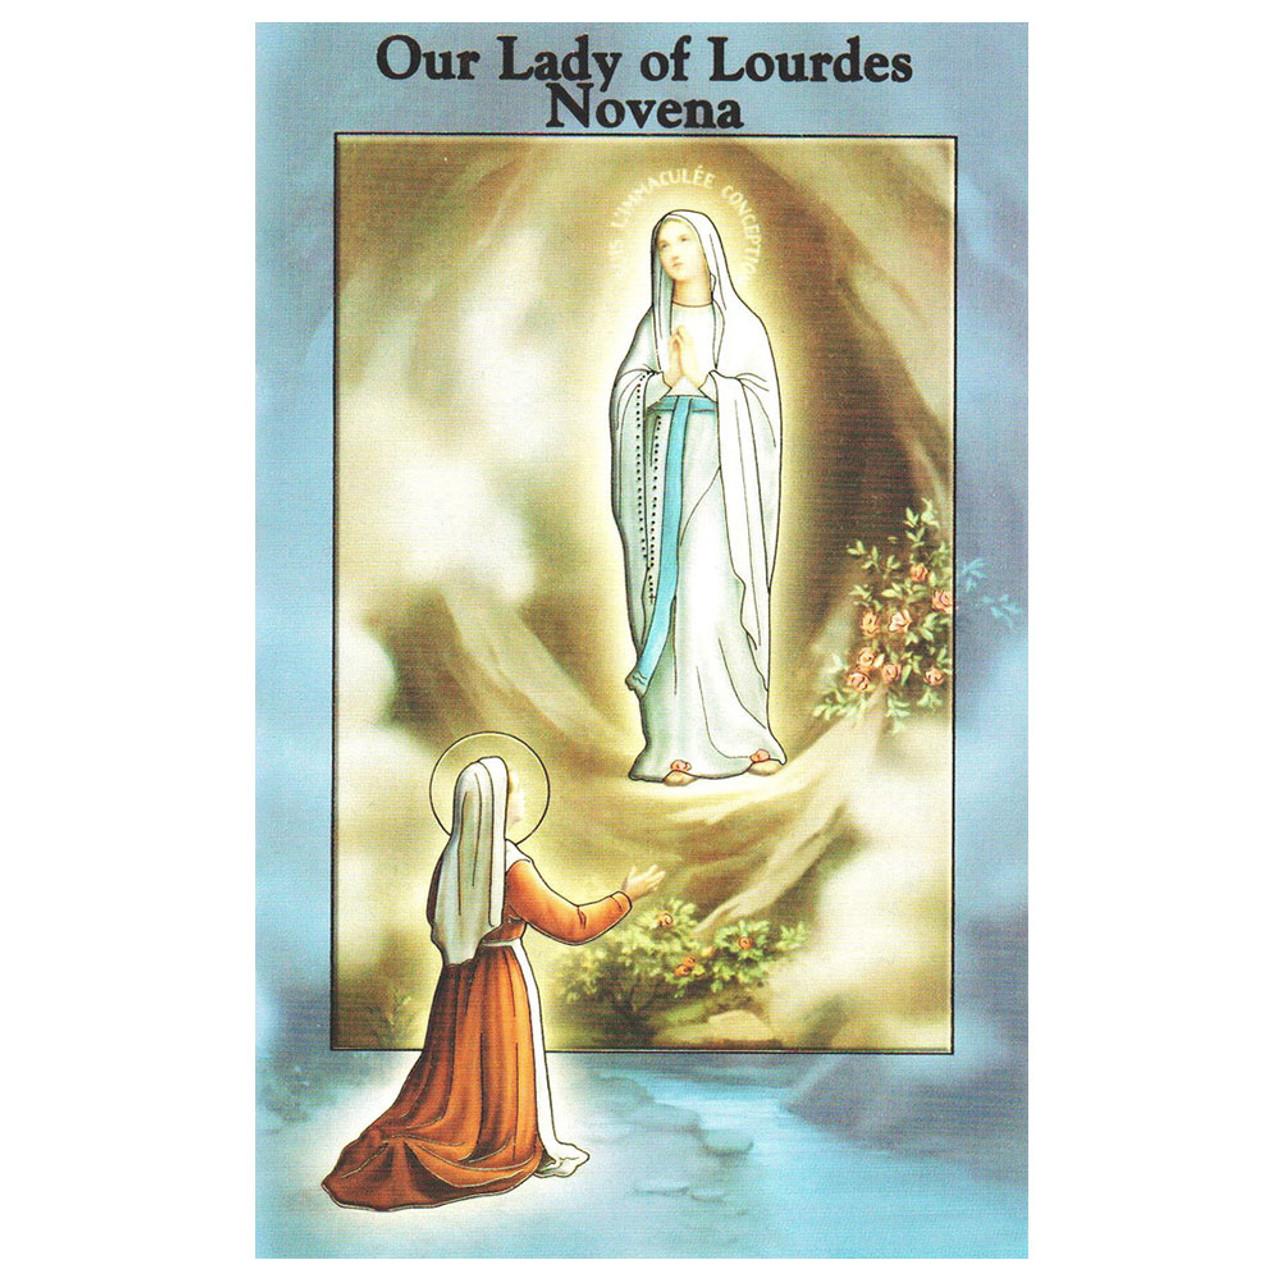 Our Lady of Lourdes Novena